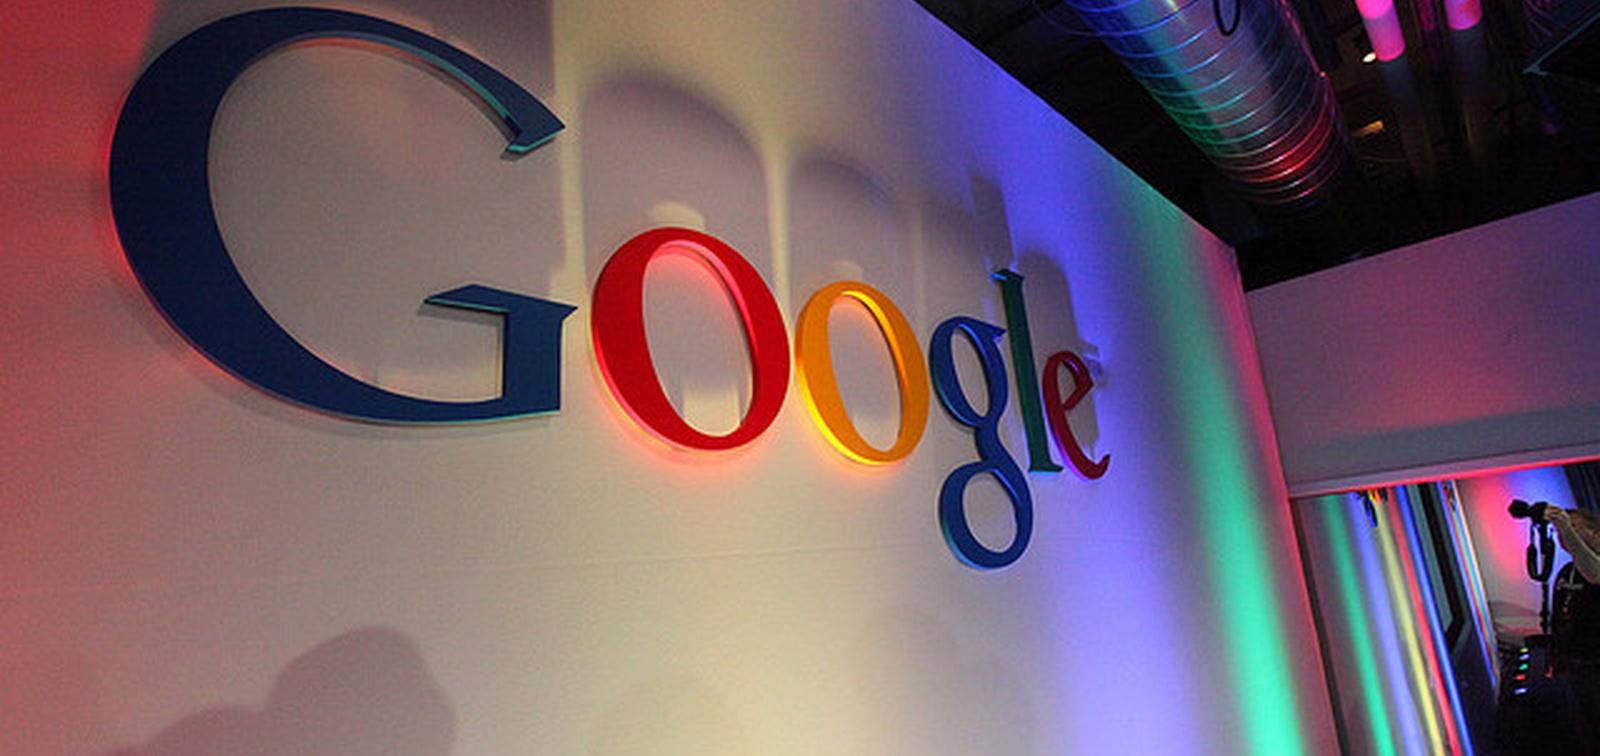 Google launches interoperability program in advance of data-sharing deadlines